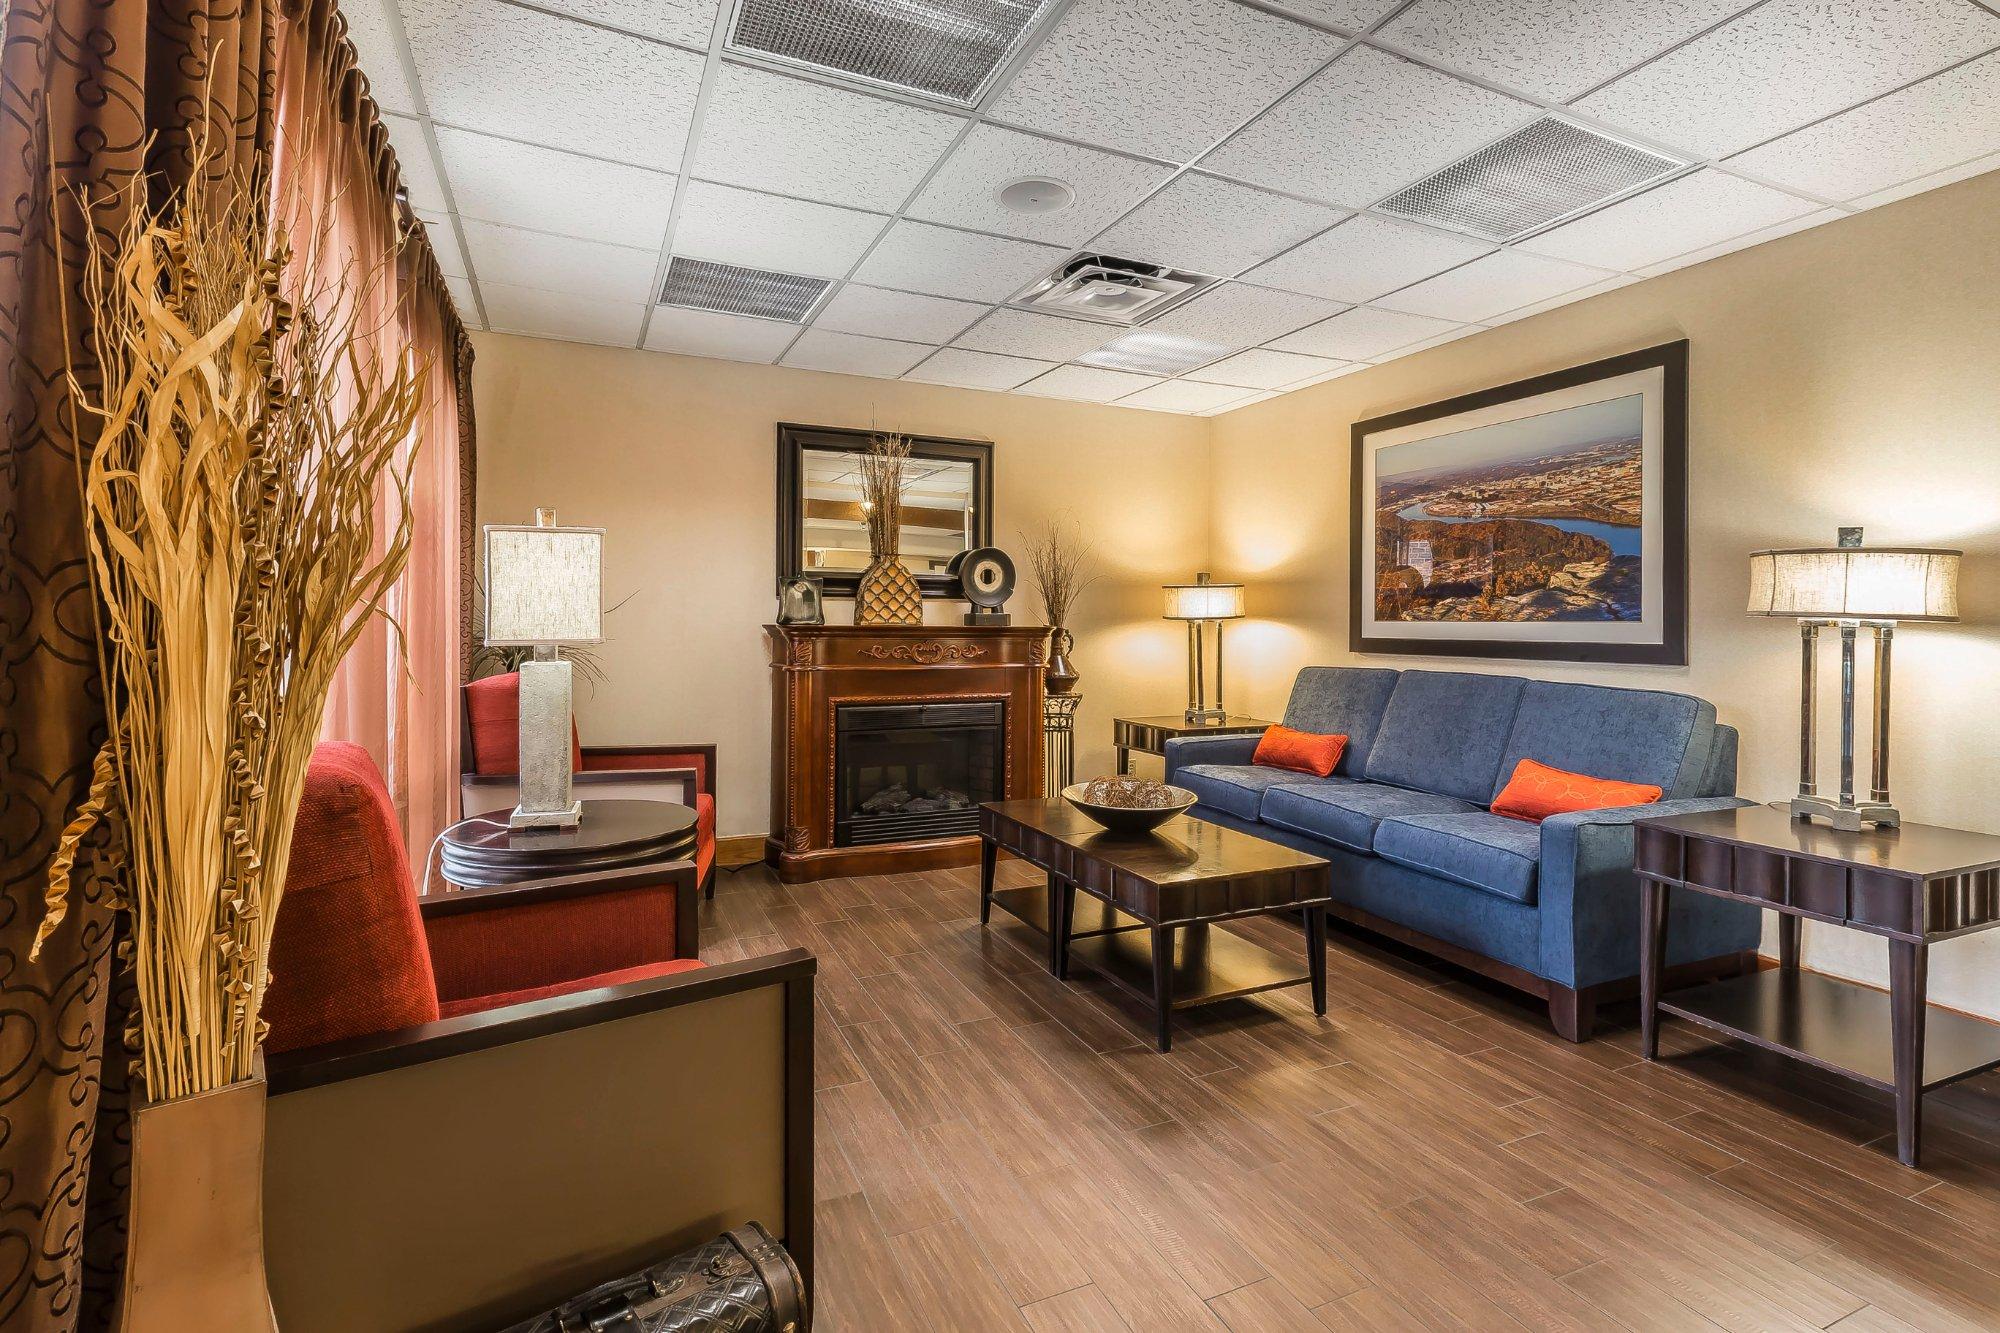 Comfort Inn Chattanooga Tn 2018 Hotel Review Family